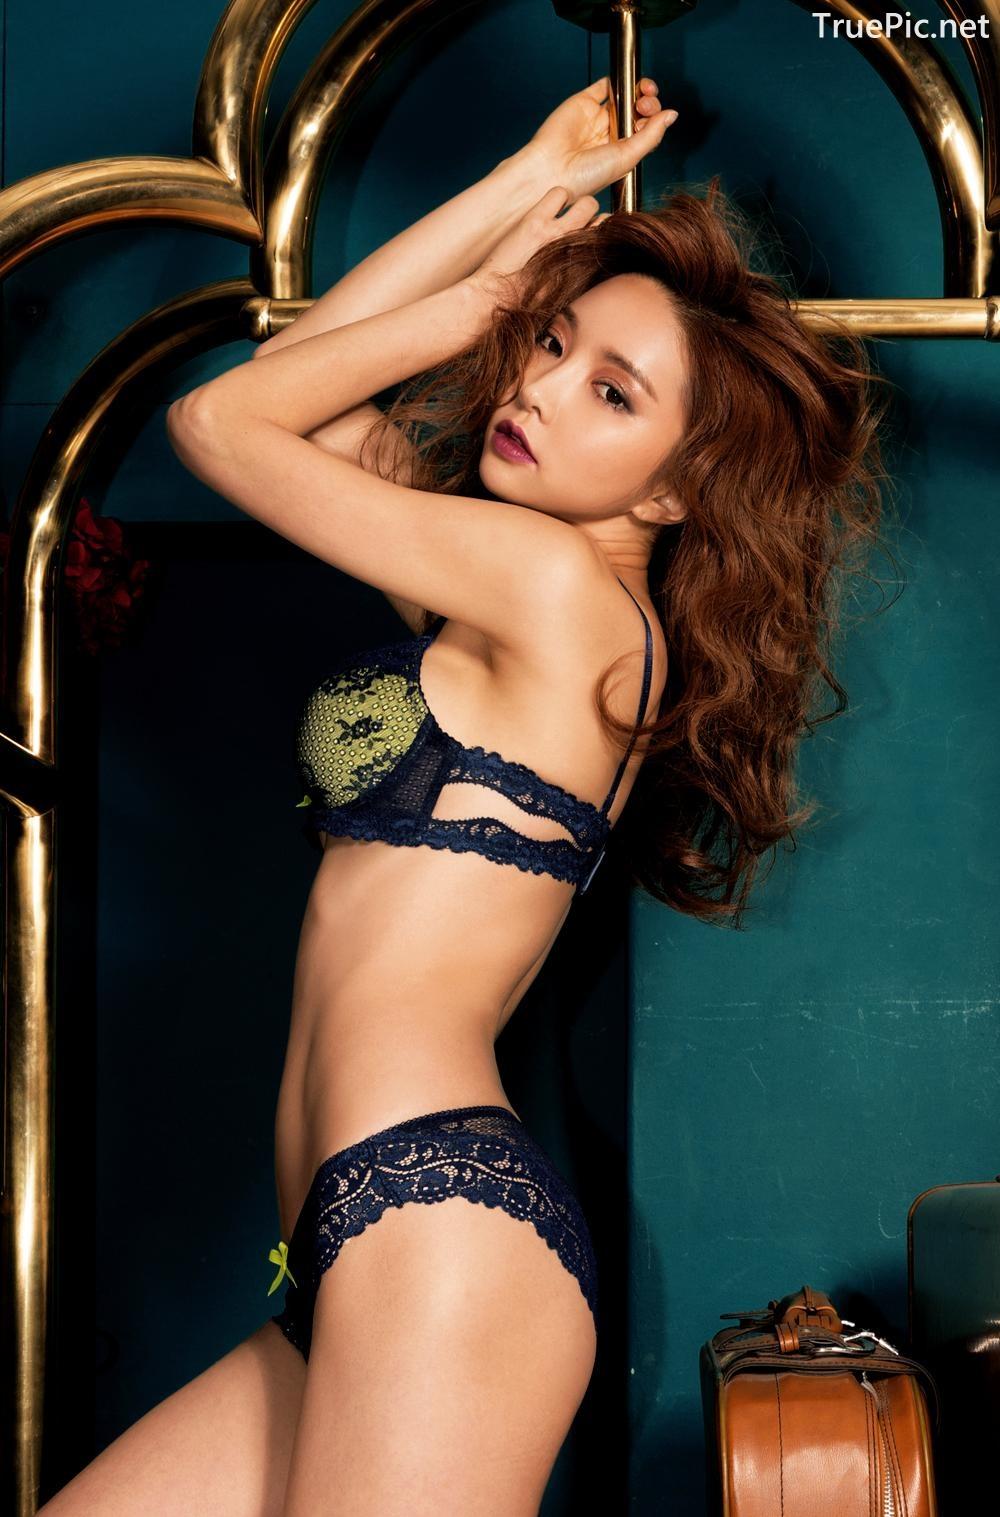 Image Korean Fashion Model - Park Soo Yeon - BVB Black Lace Lingerie - TruePic.net - Picture-2